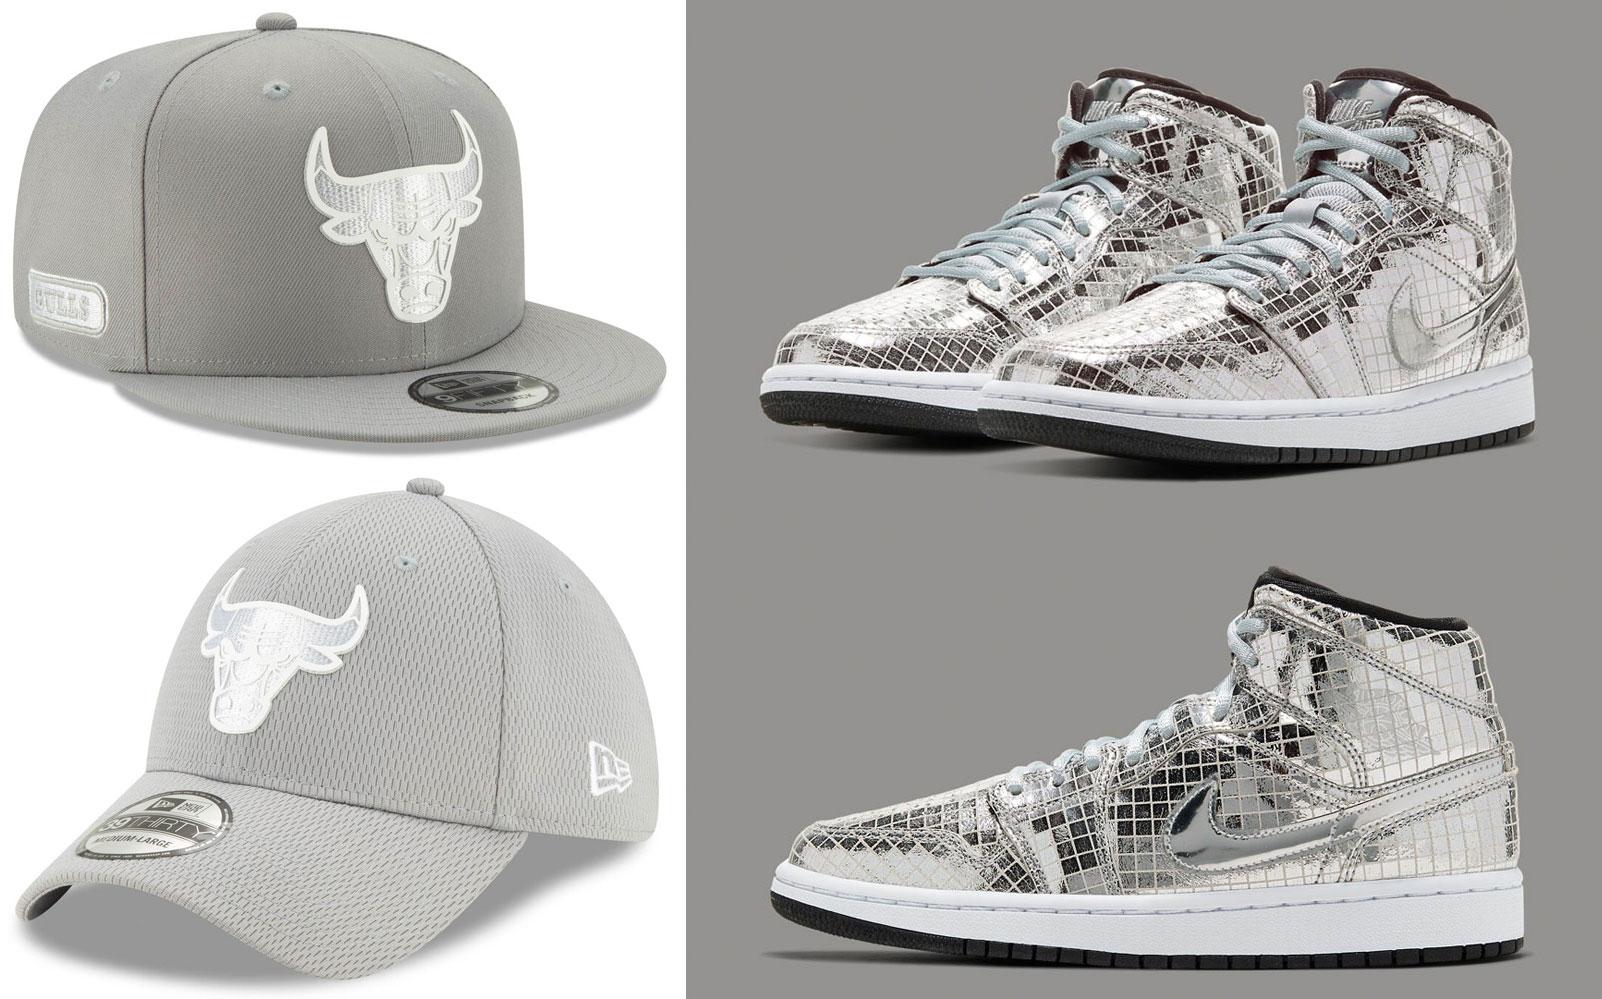 air-jordan-1-mid-disco-ball-silver-bulls-hats